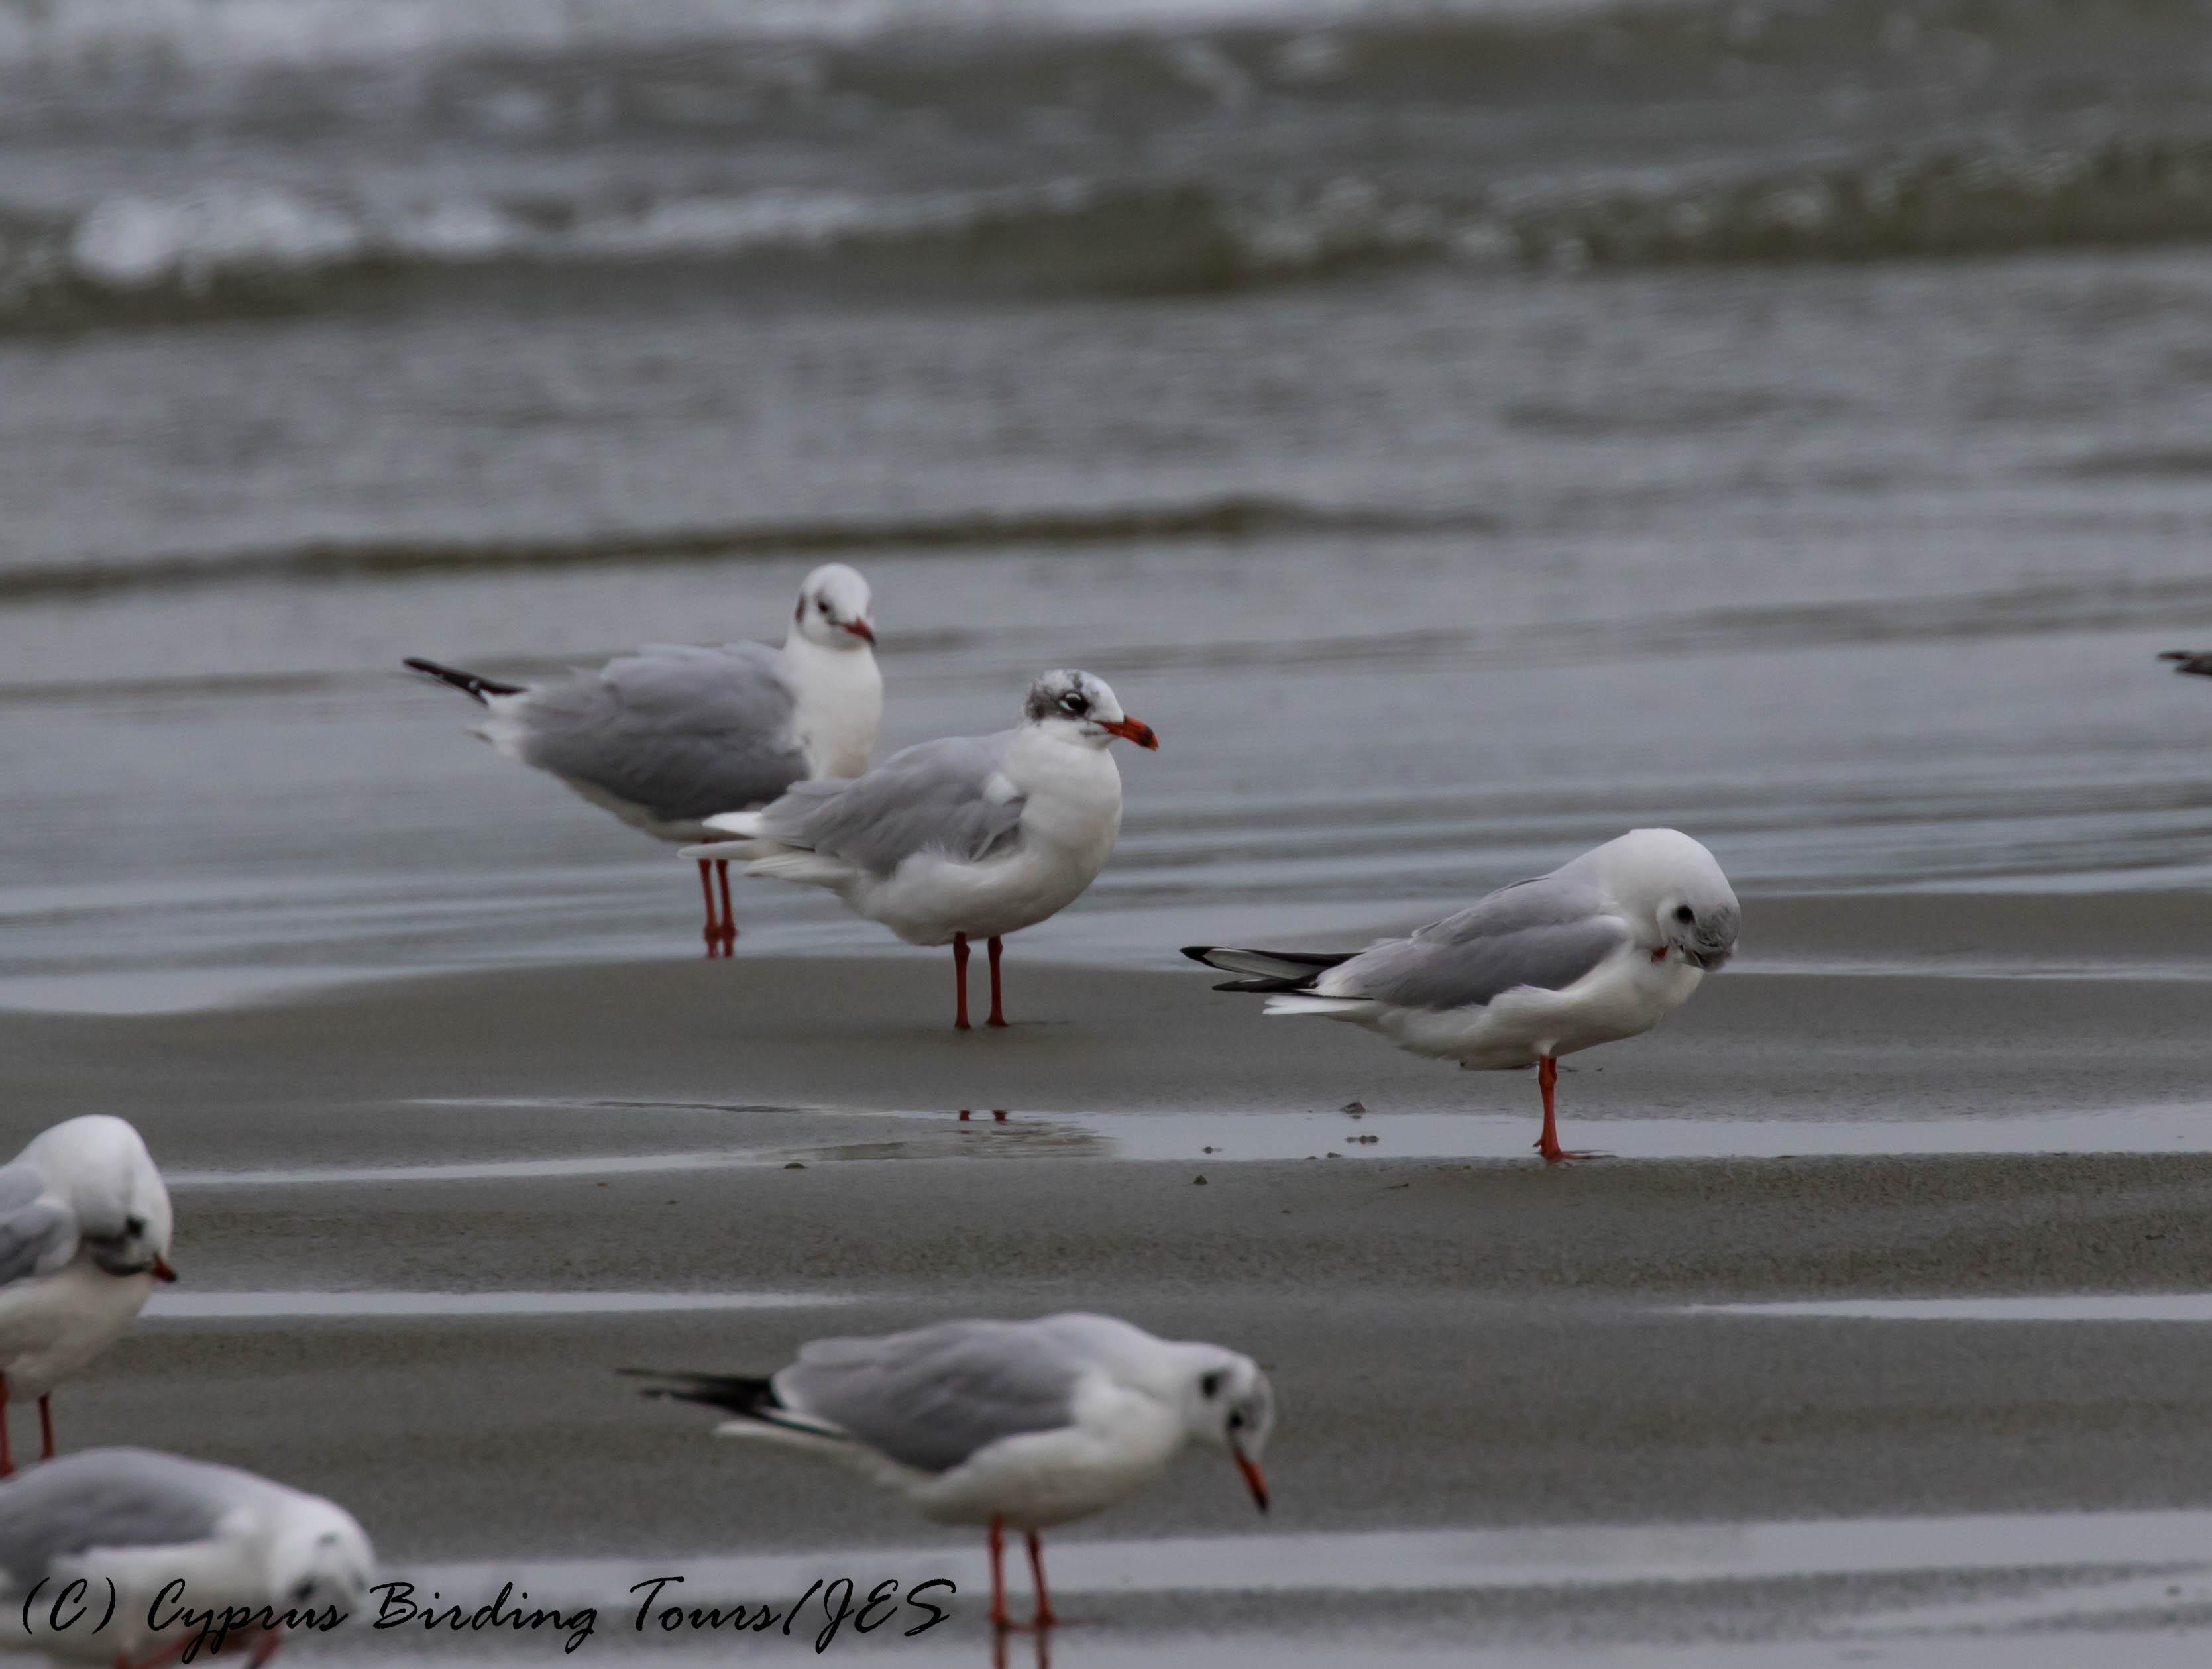 Mediterranean Gull, adult, Oroklini Beach 8th January 2017 (c) Cyprus Birding Tours